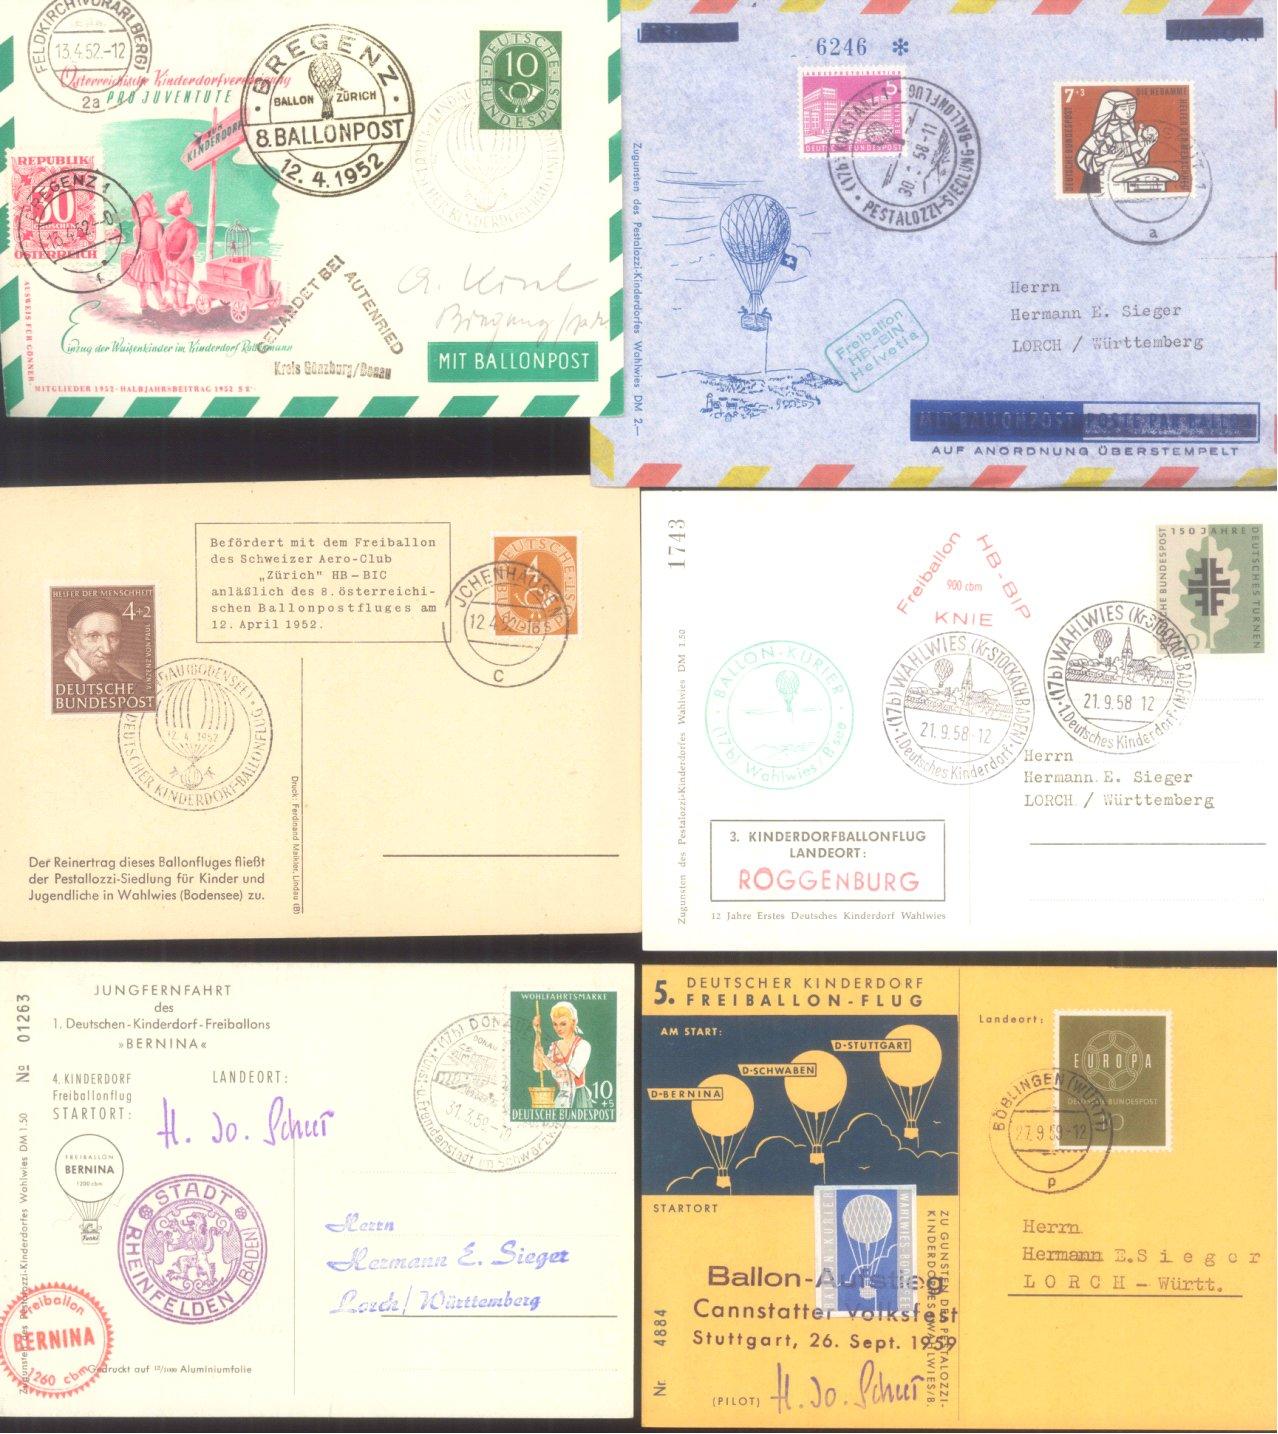 MOTIV BALLONPOST / KINDERDORF BALLONPOST 1952-1972